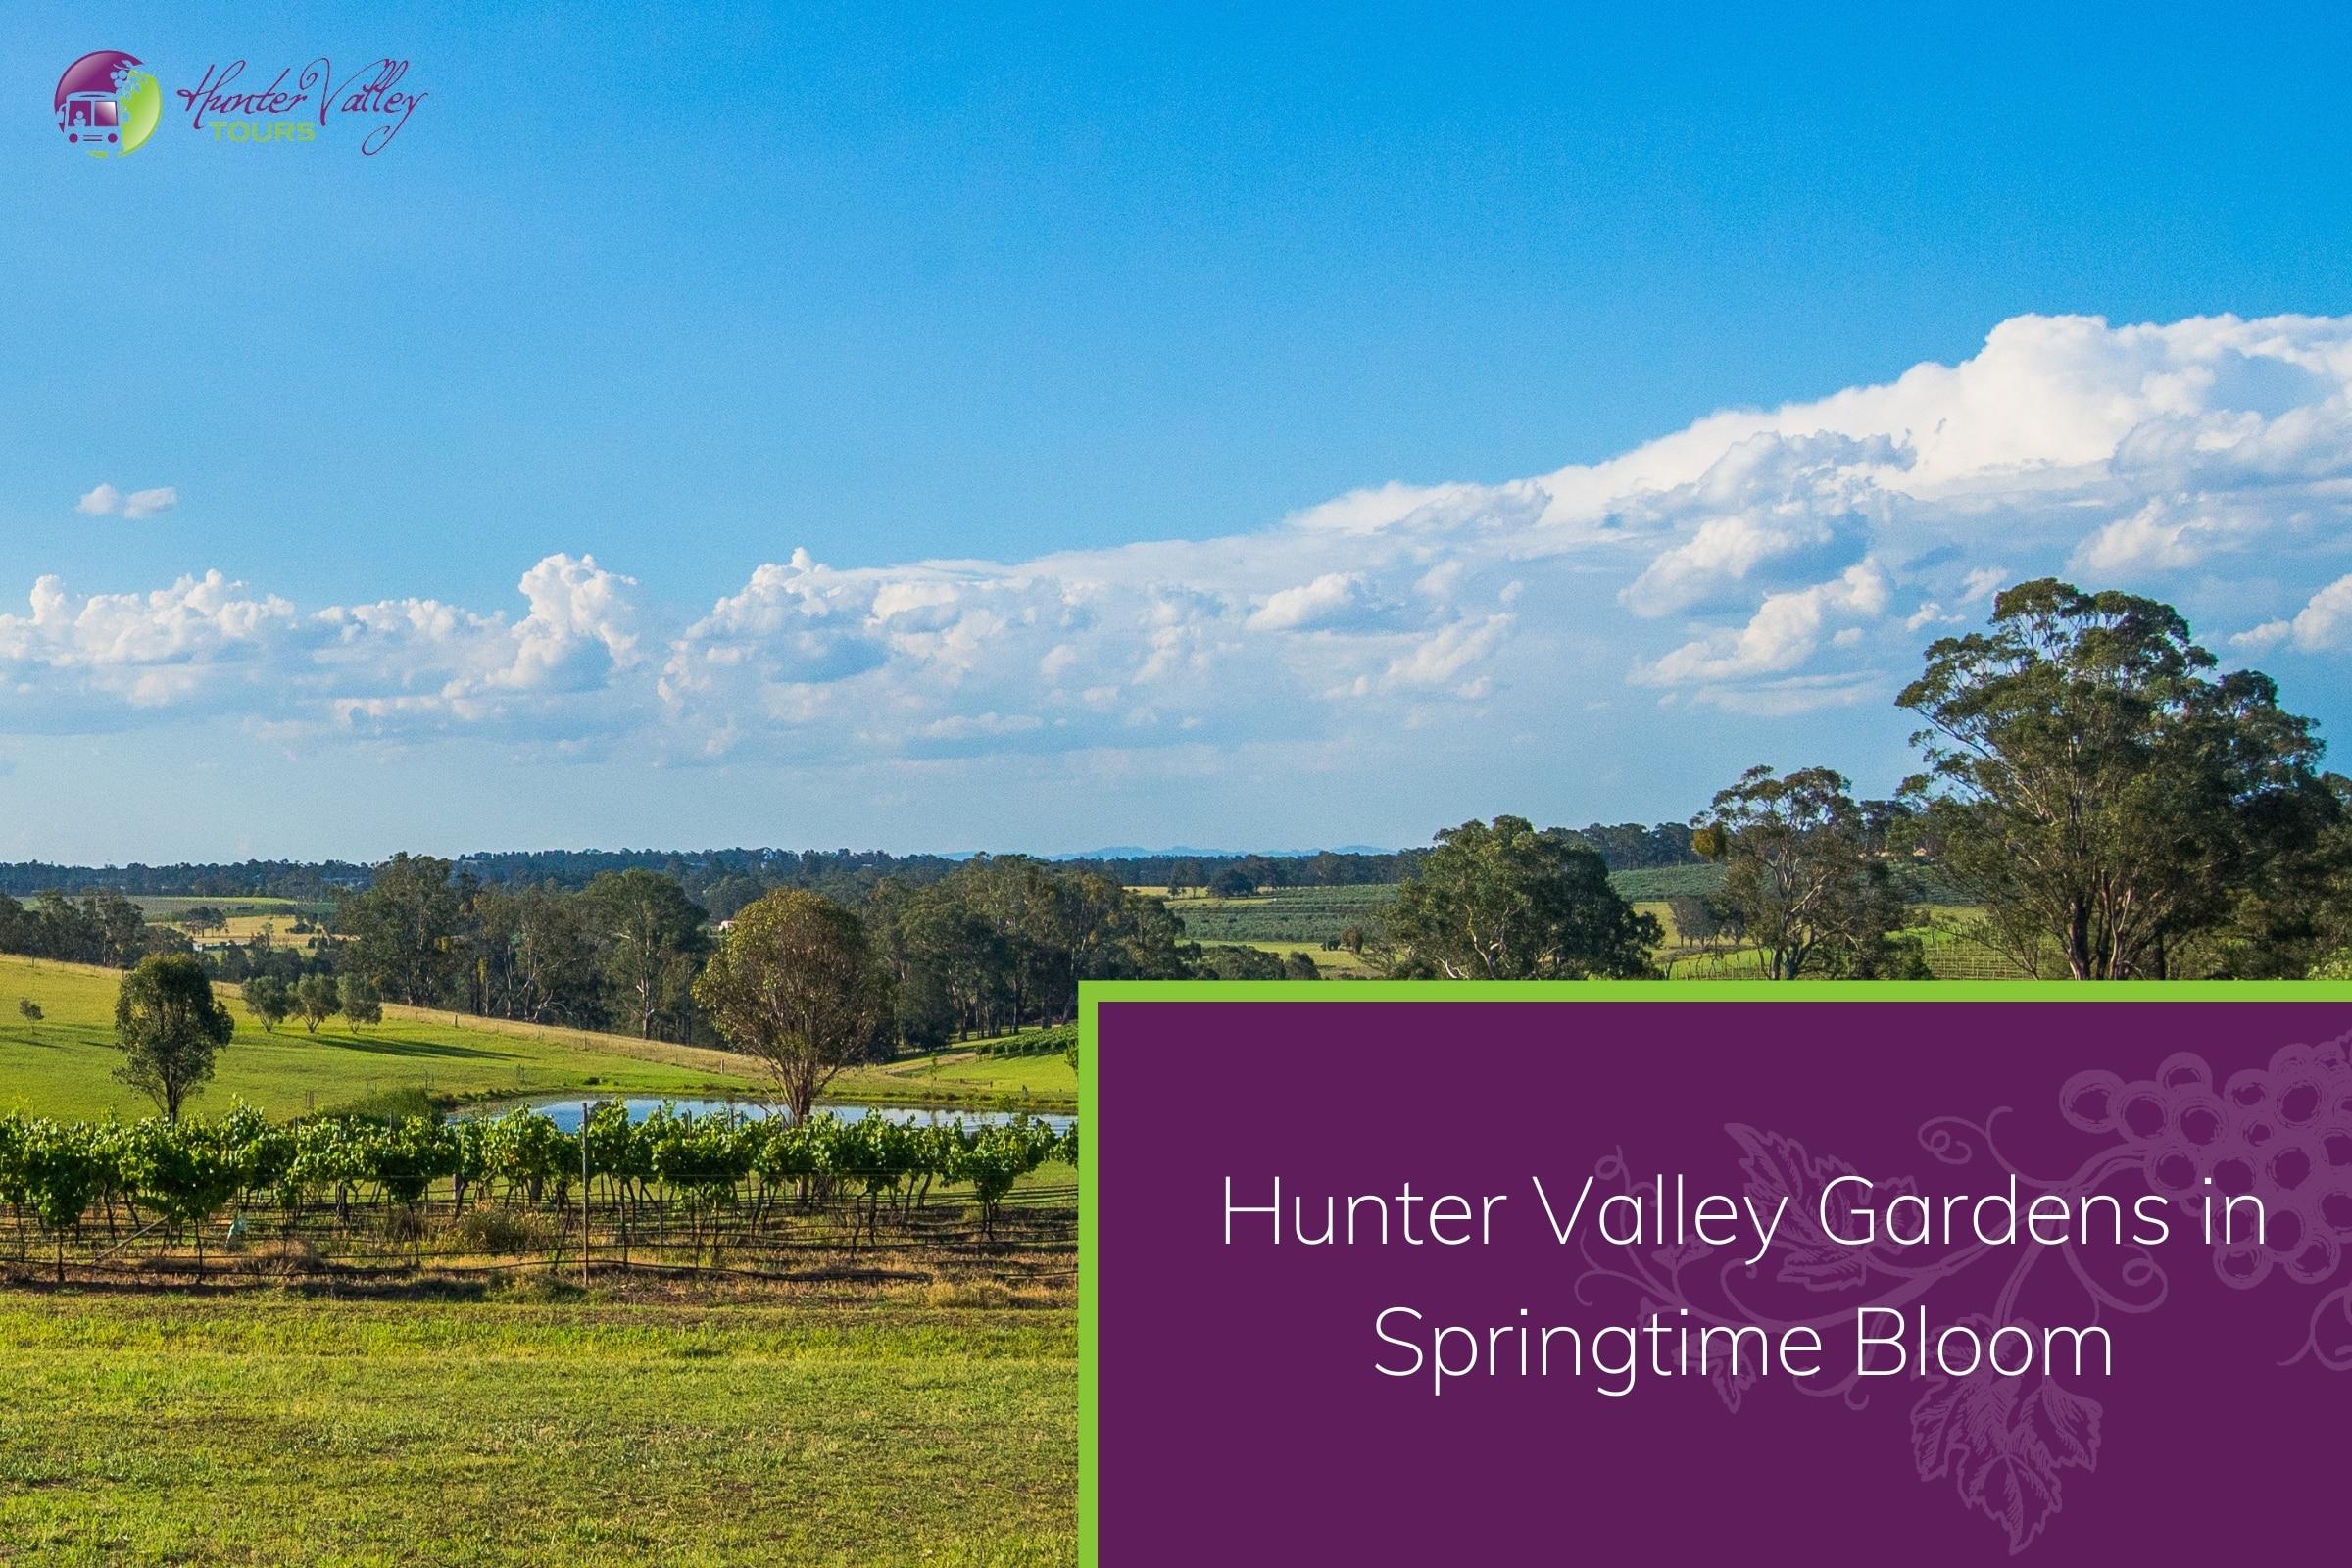 Hunter Valley Gardens in Springtime Bloom